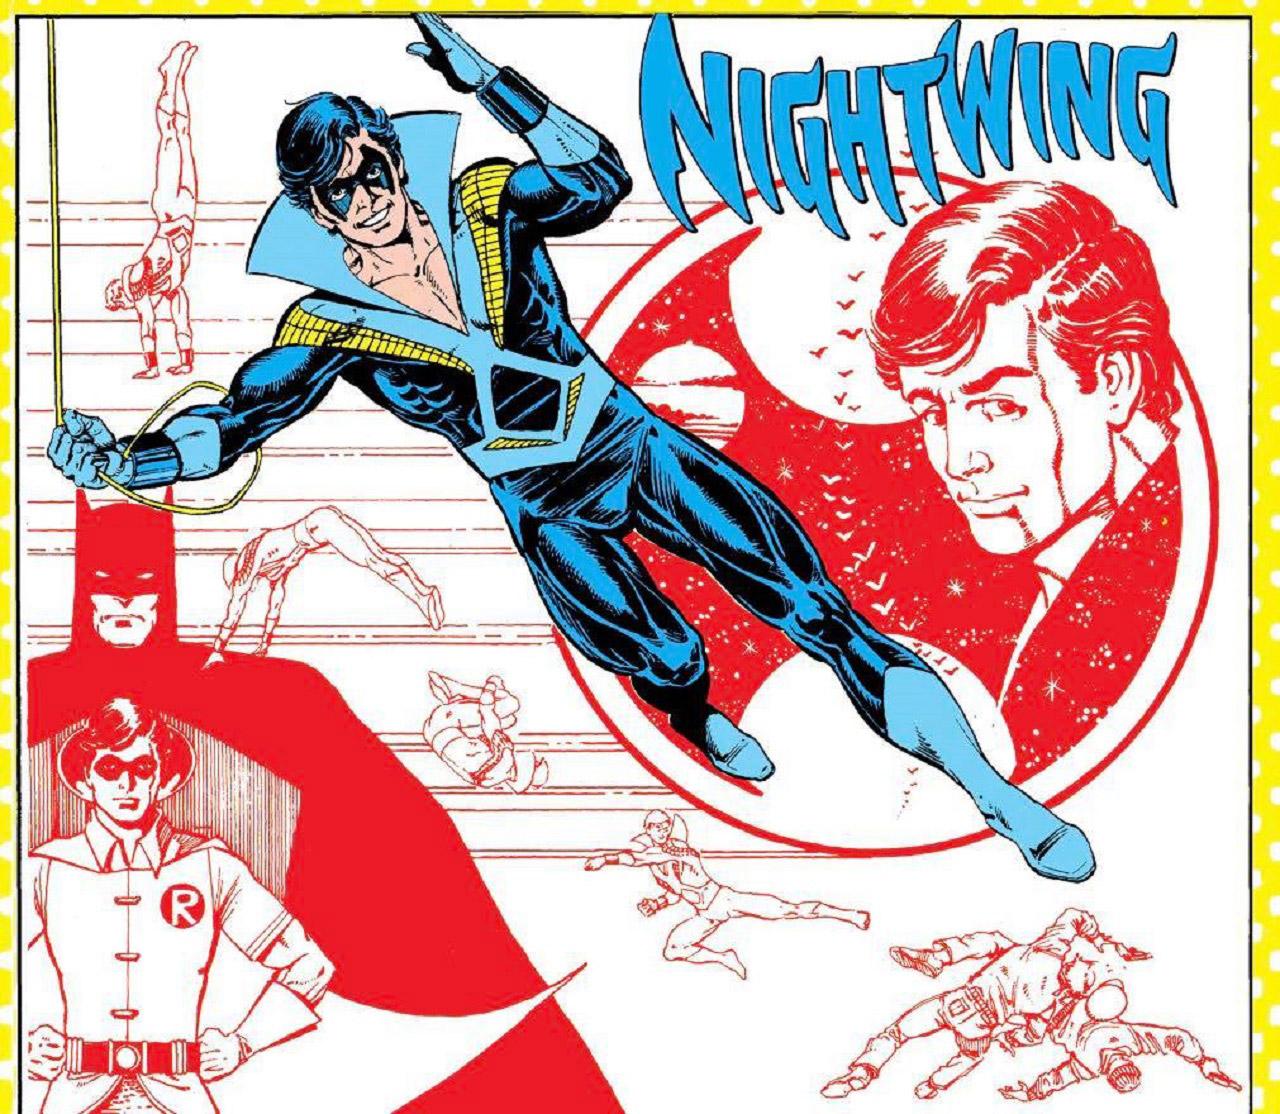 Nightwing-9.jpg